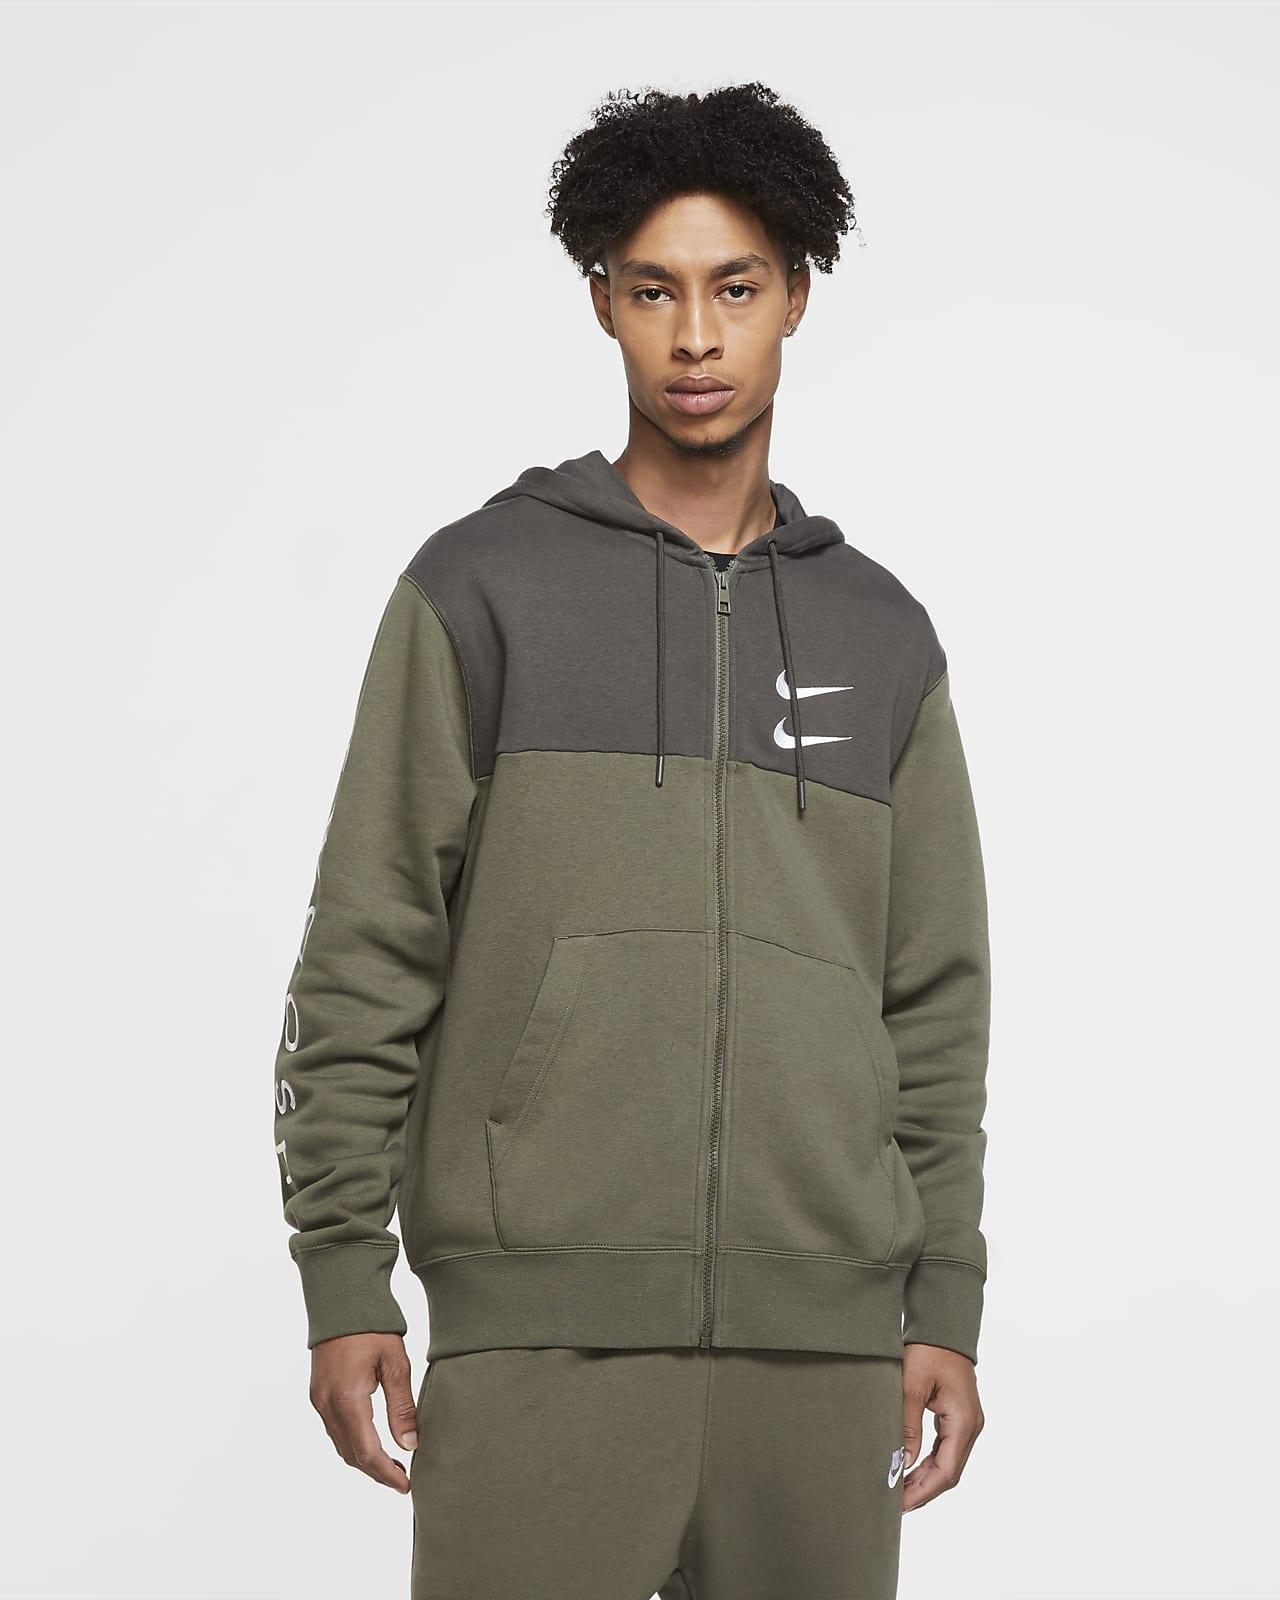 Nike Sportswear Swoosh Sudadera con capucha y cremallera completa - Hombre